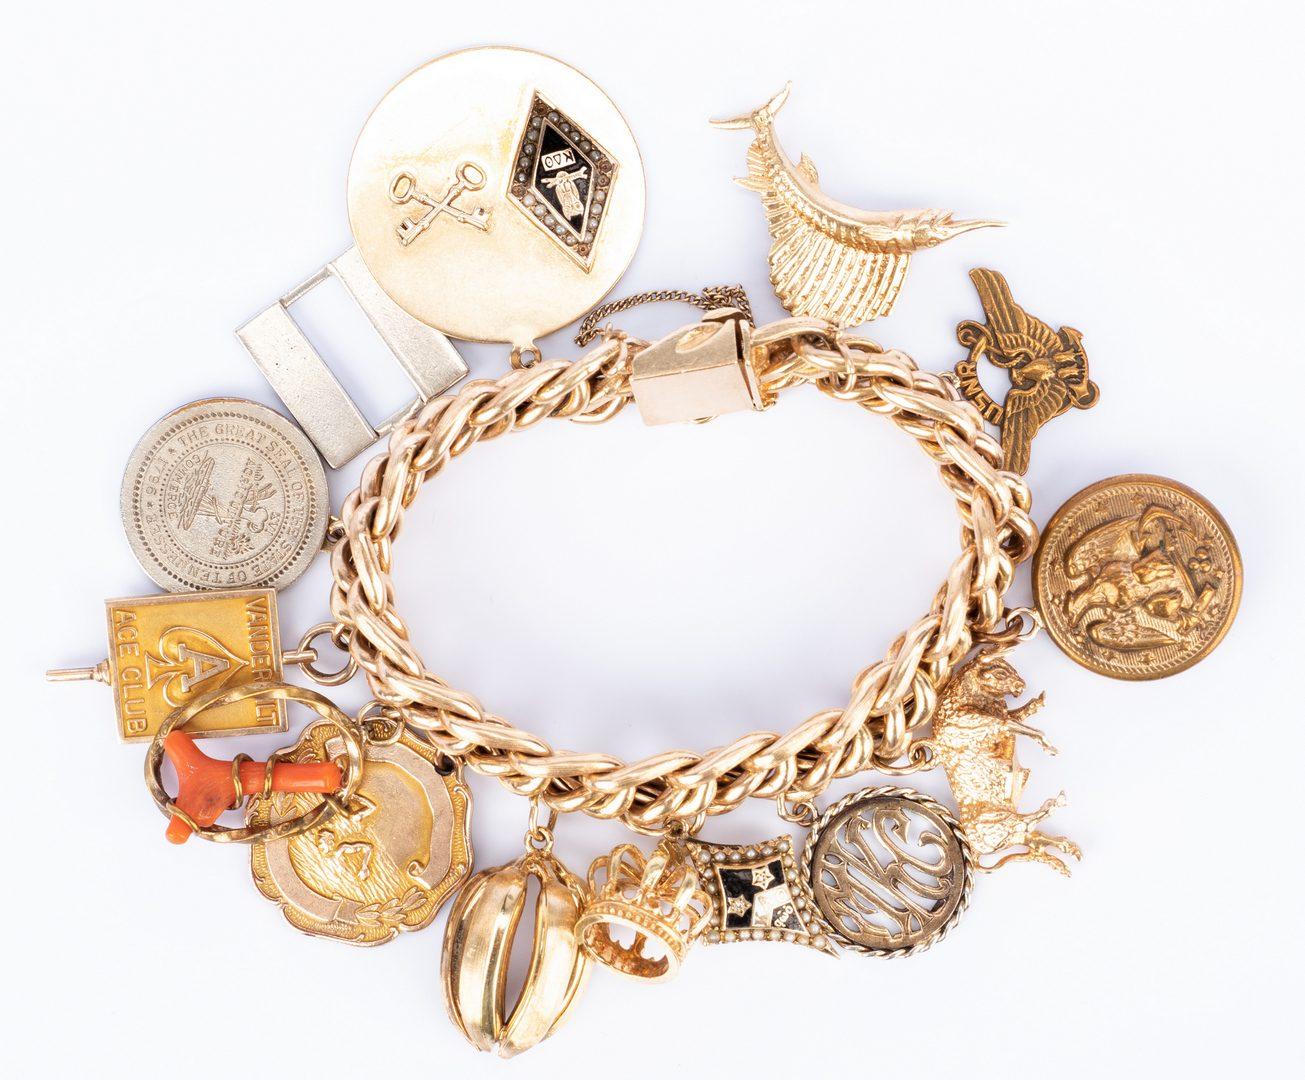 Lot 180: 14K Heavy Charm Bracelet